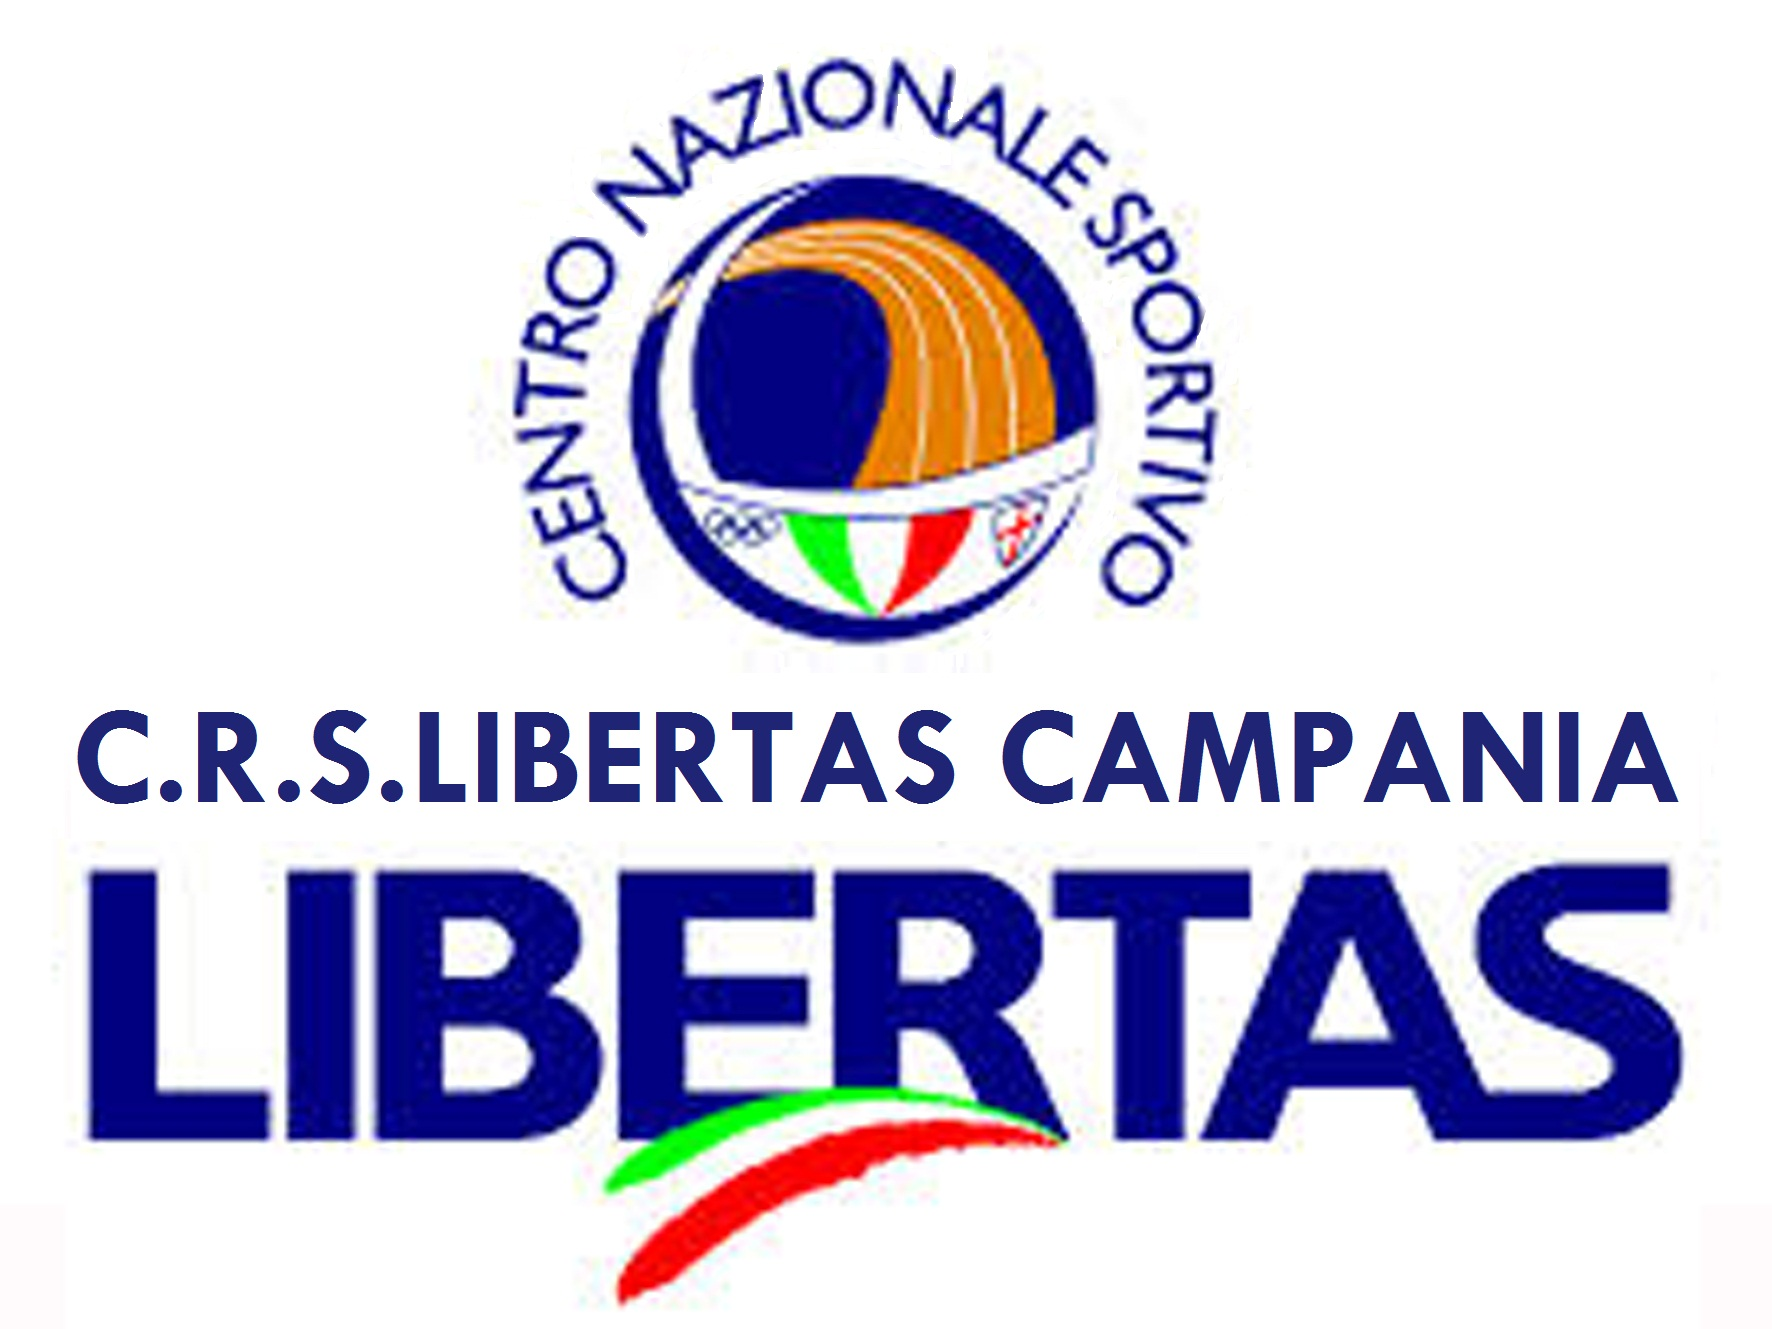 Centro Regionale Sportivo Libertas Campania